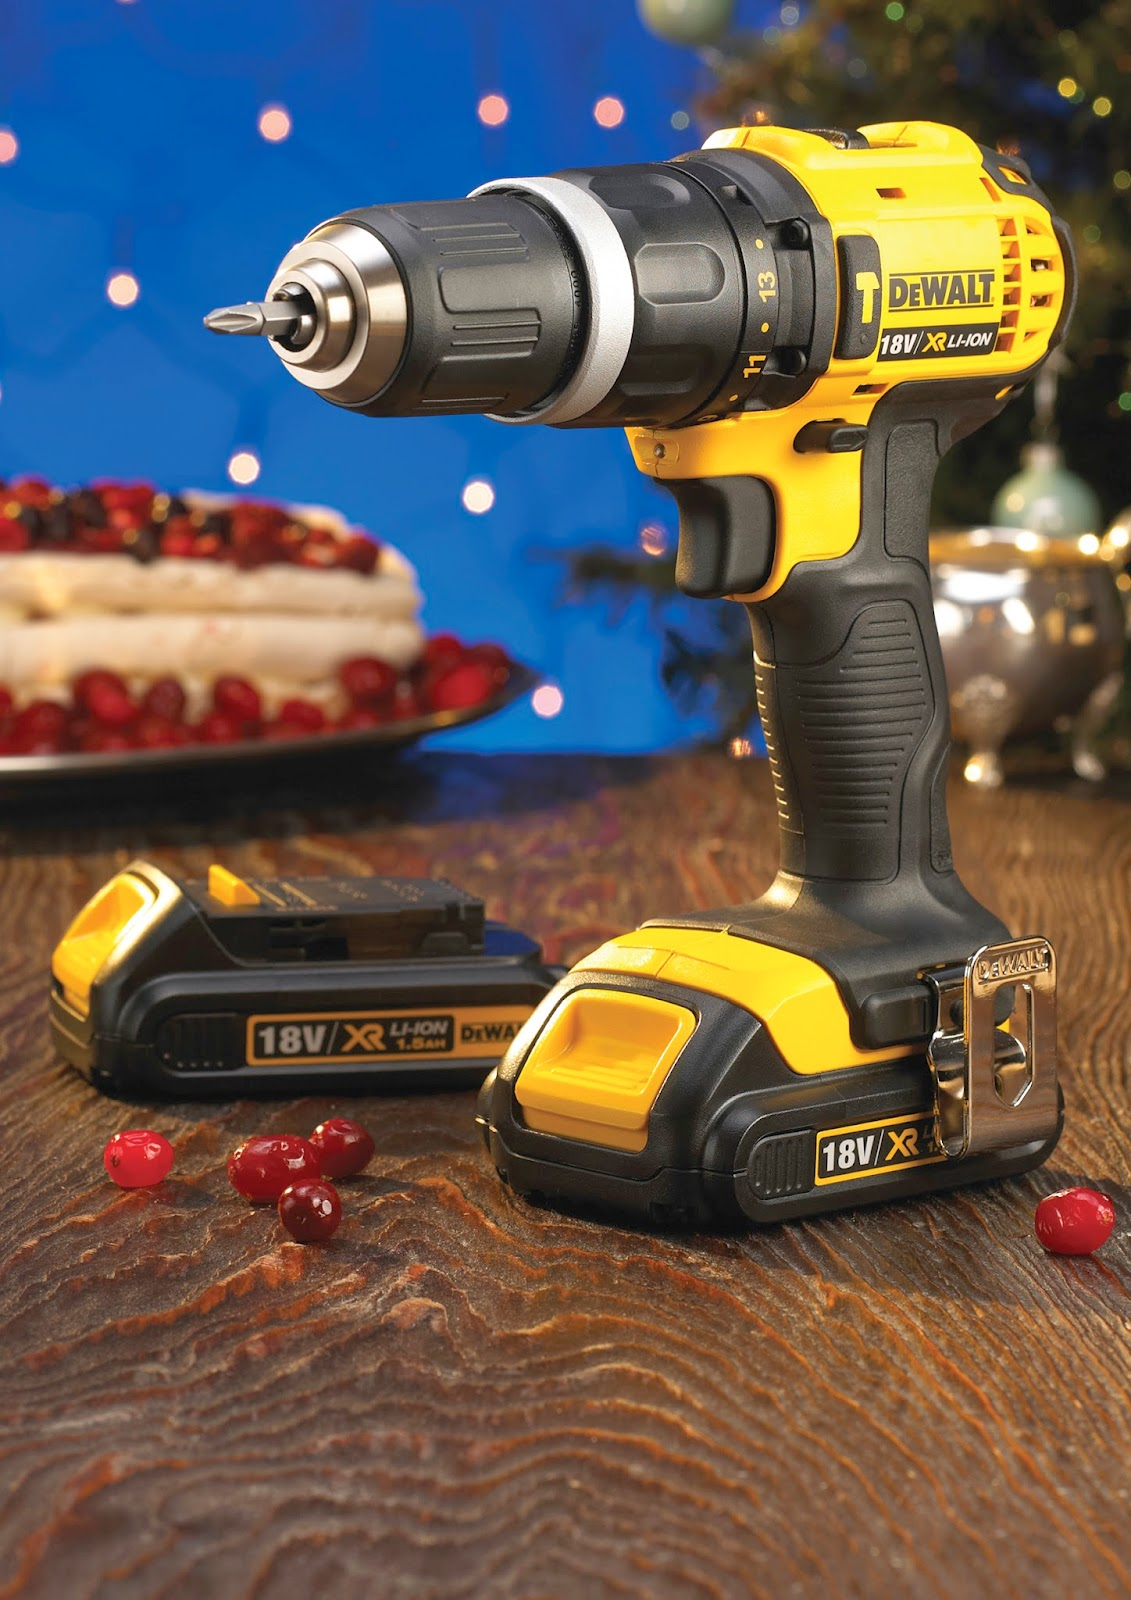 http://www.beesleyandfildes.co.uk/dewalt-18v-combi-drill-with-2-x-1-5ah-li-ion-batteries-ref-xms14combi/